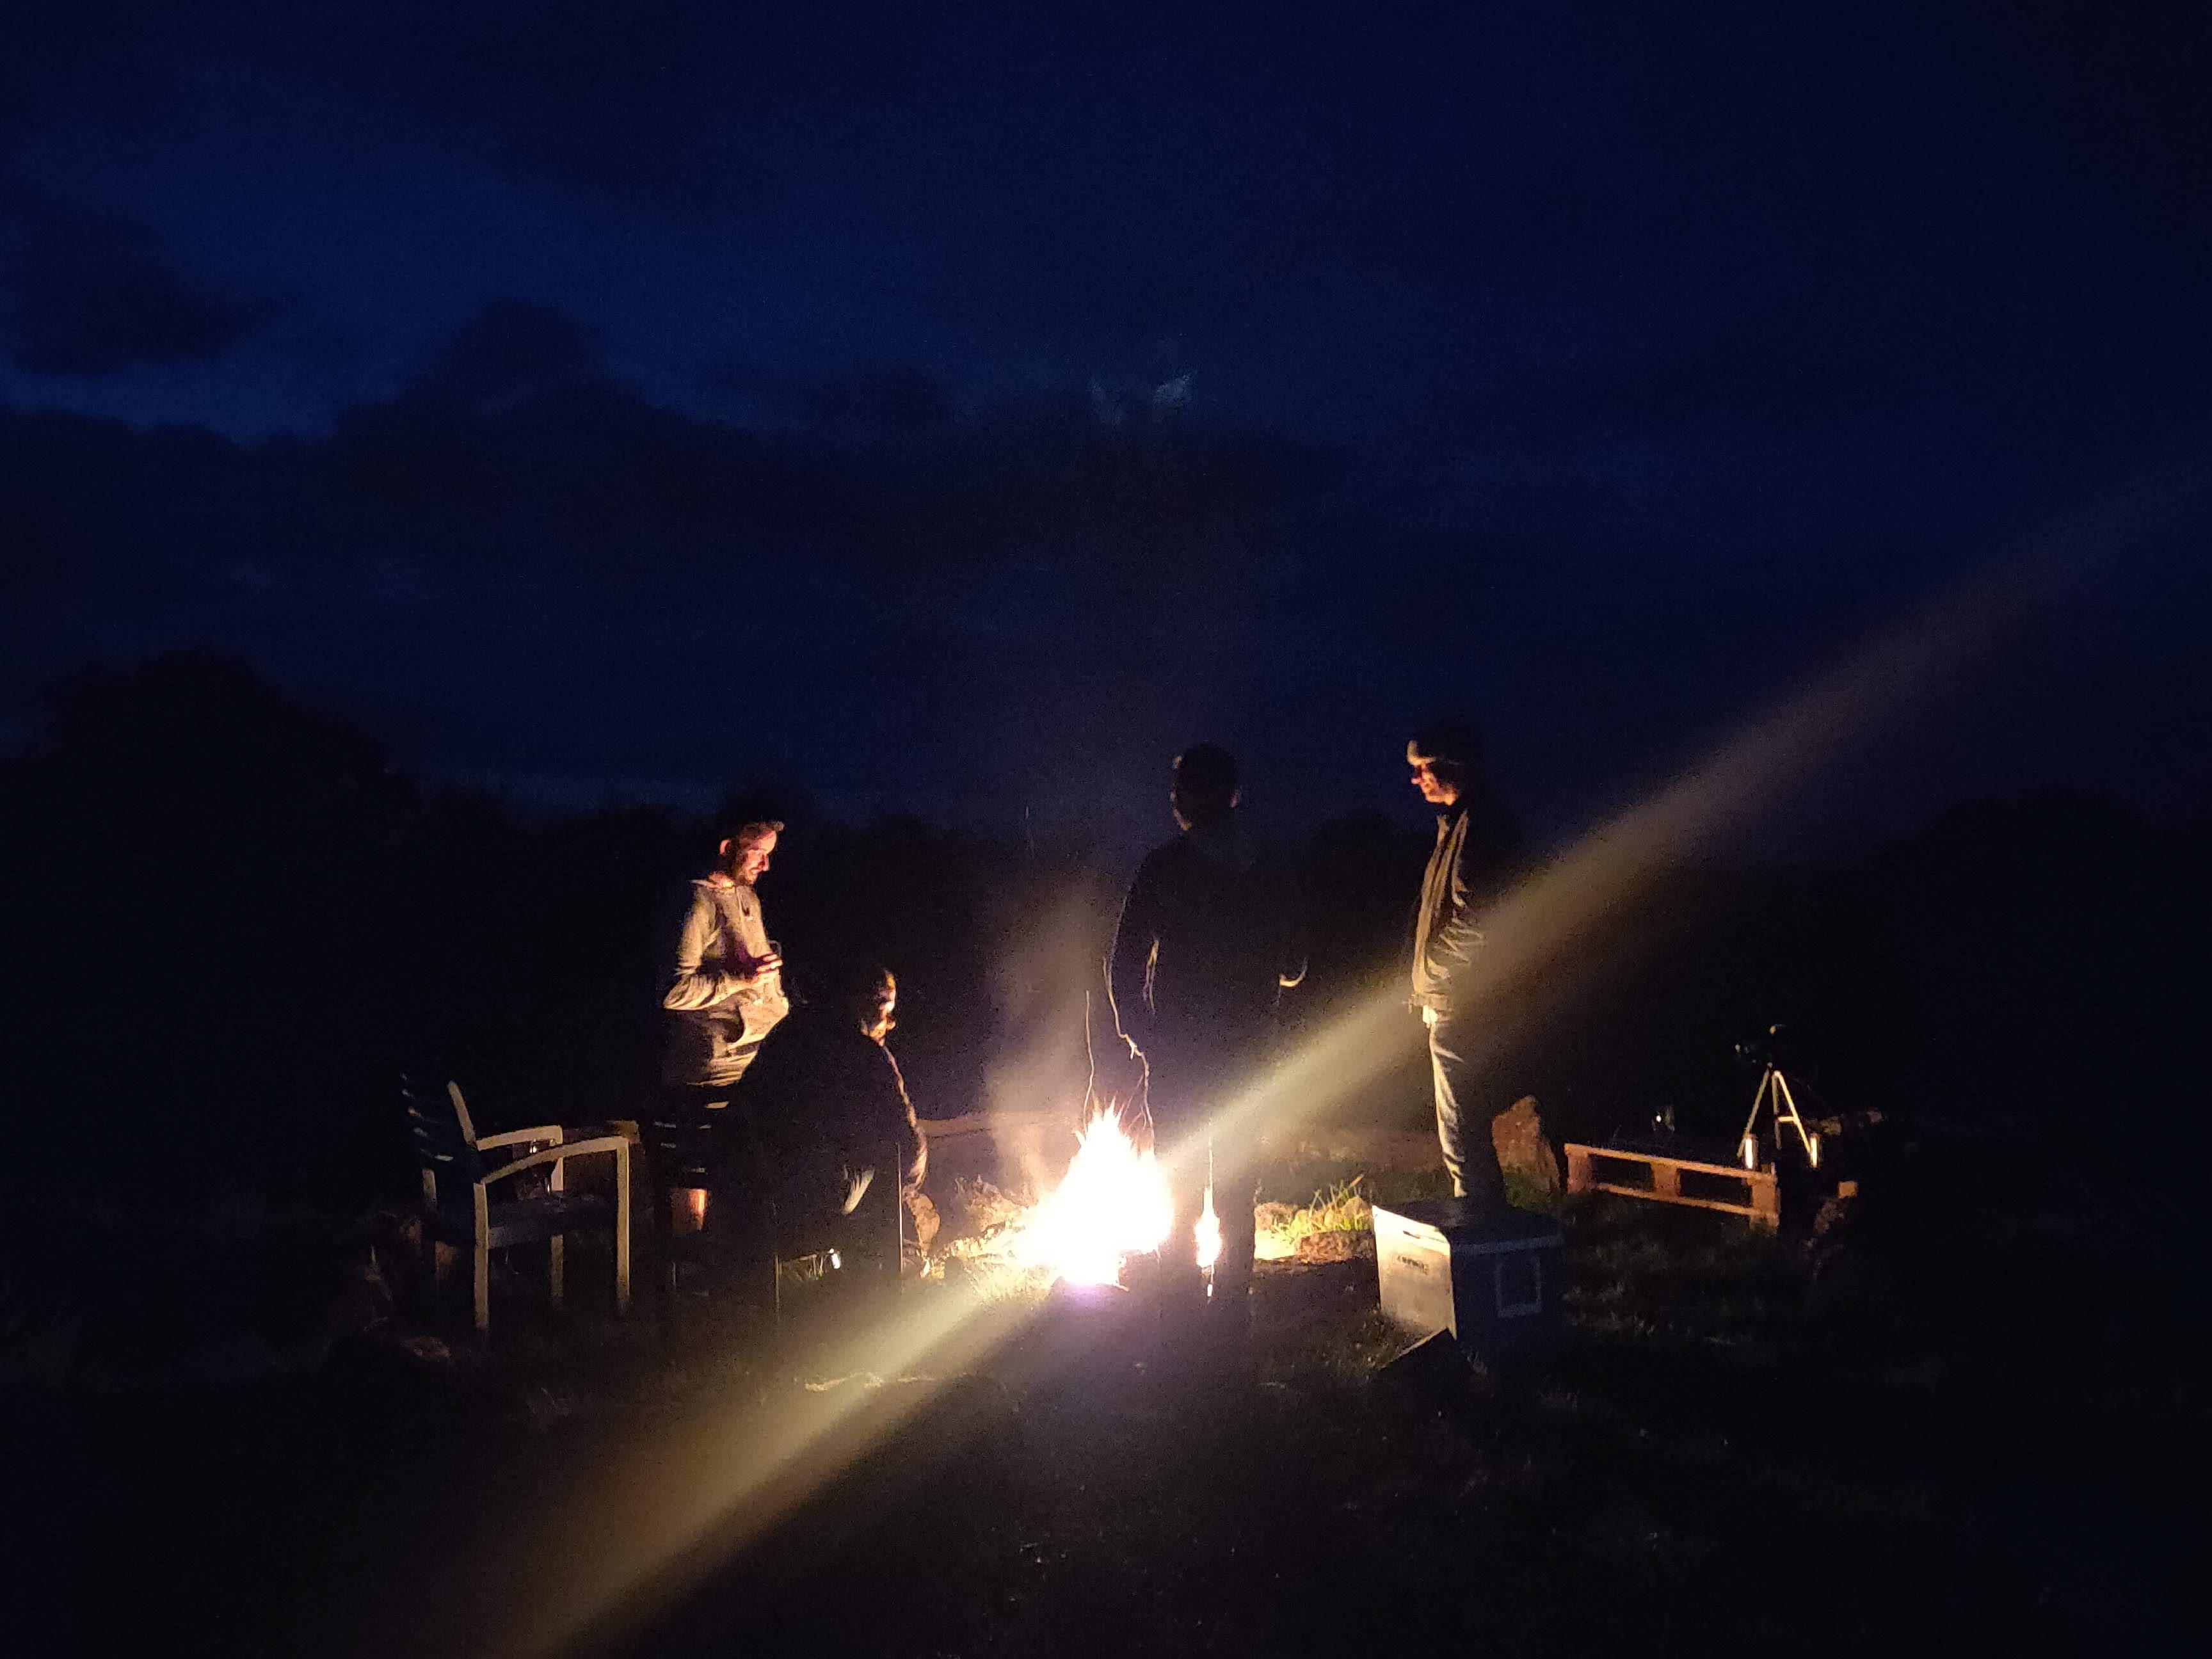 Around the fire at night